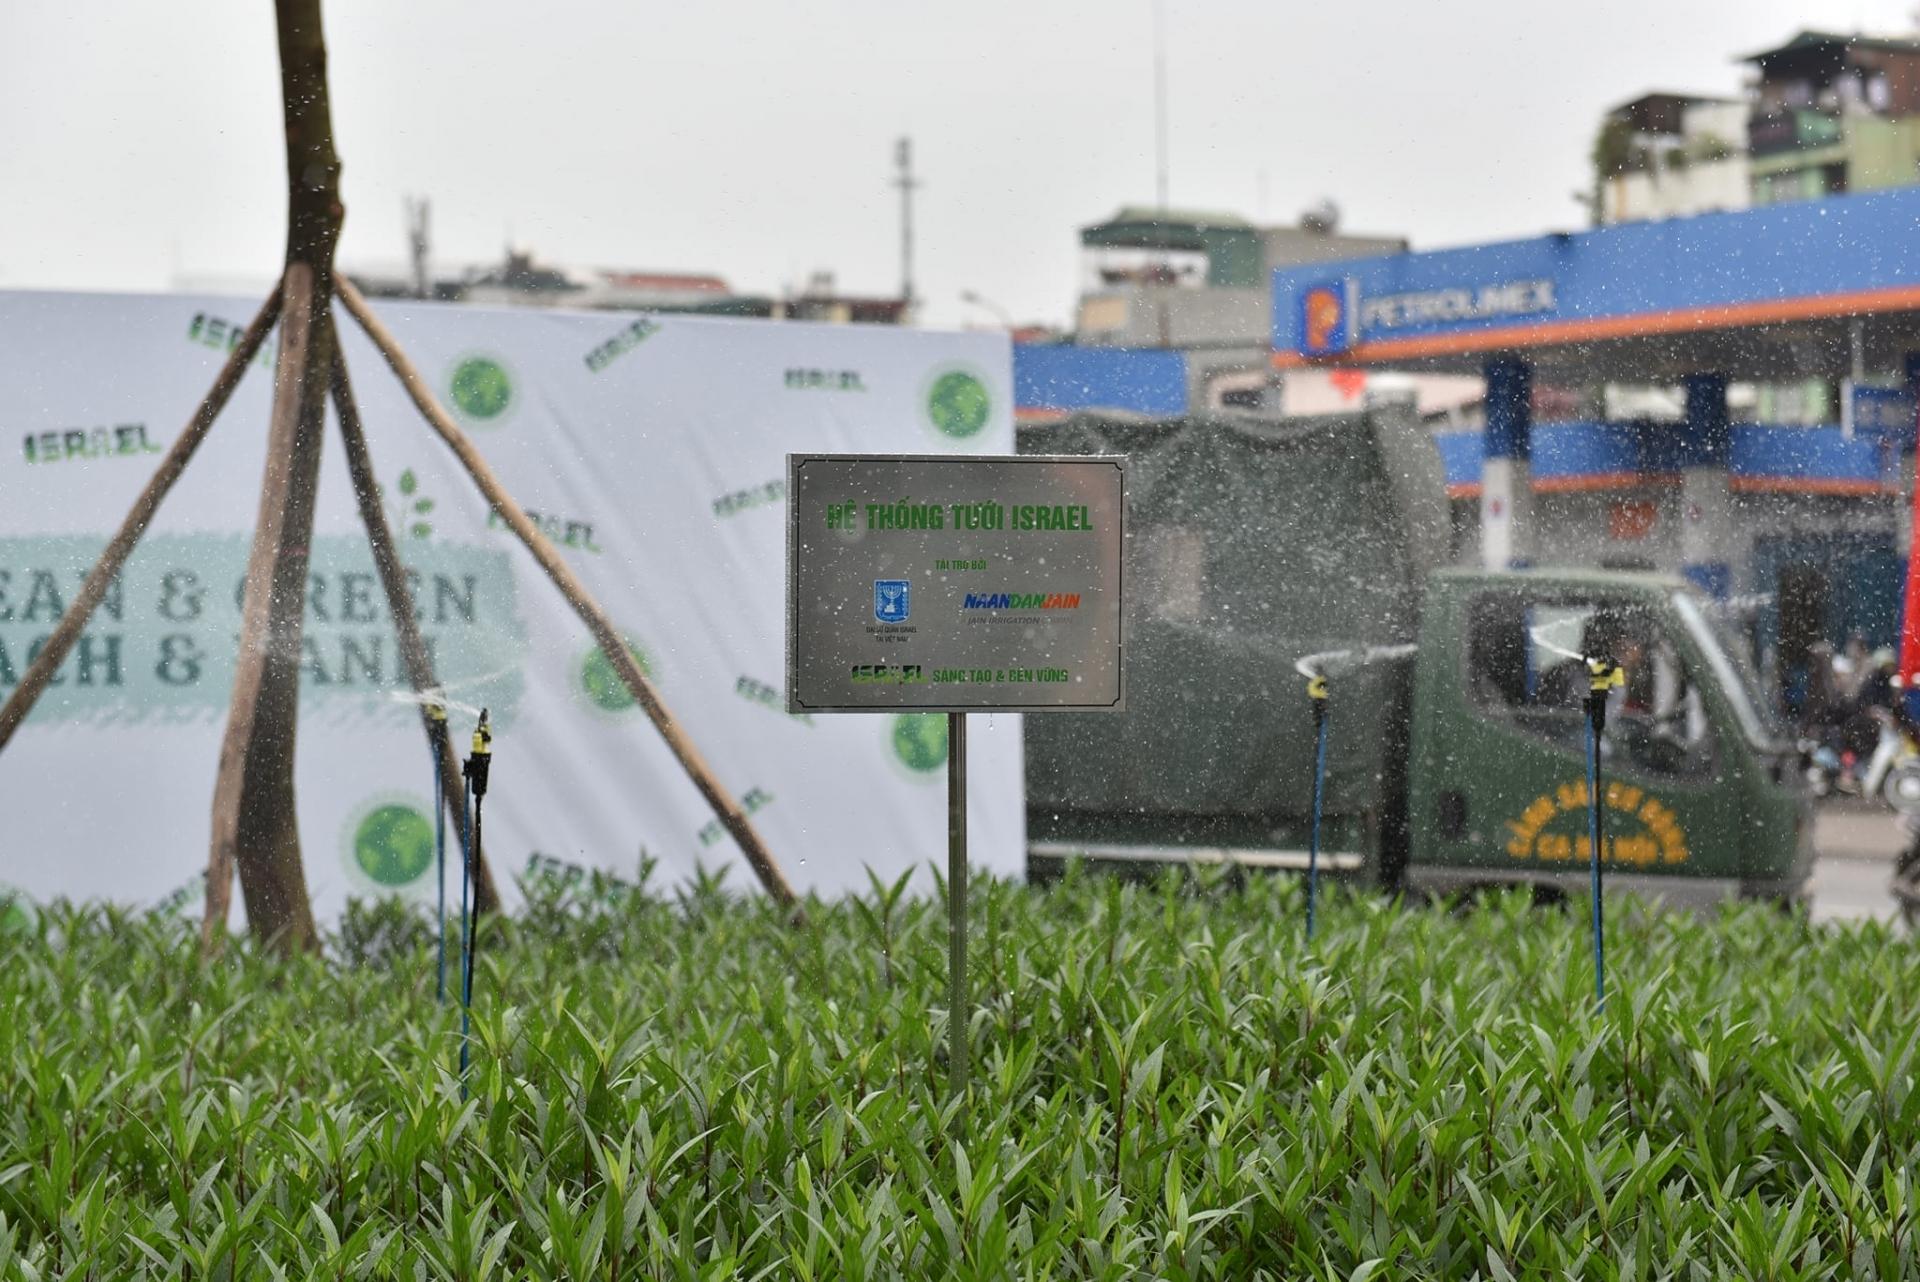 Israeli Embassy gifts solar-powered drip irrigation system to Hanoi